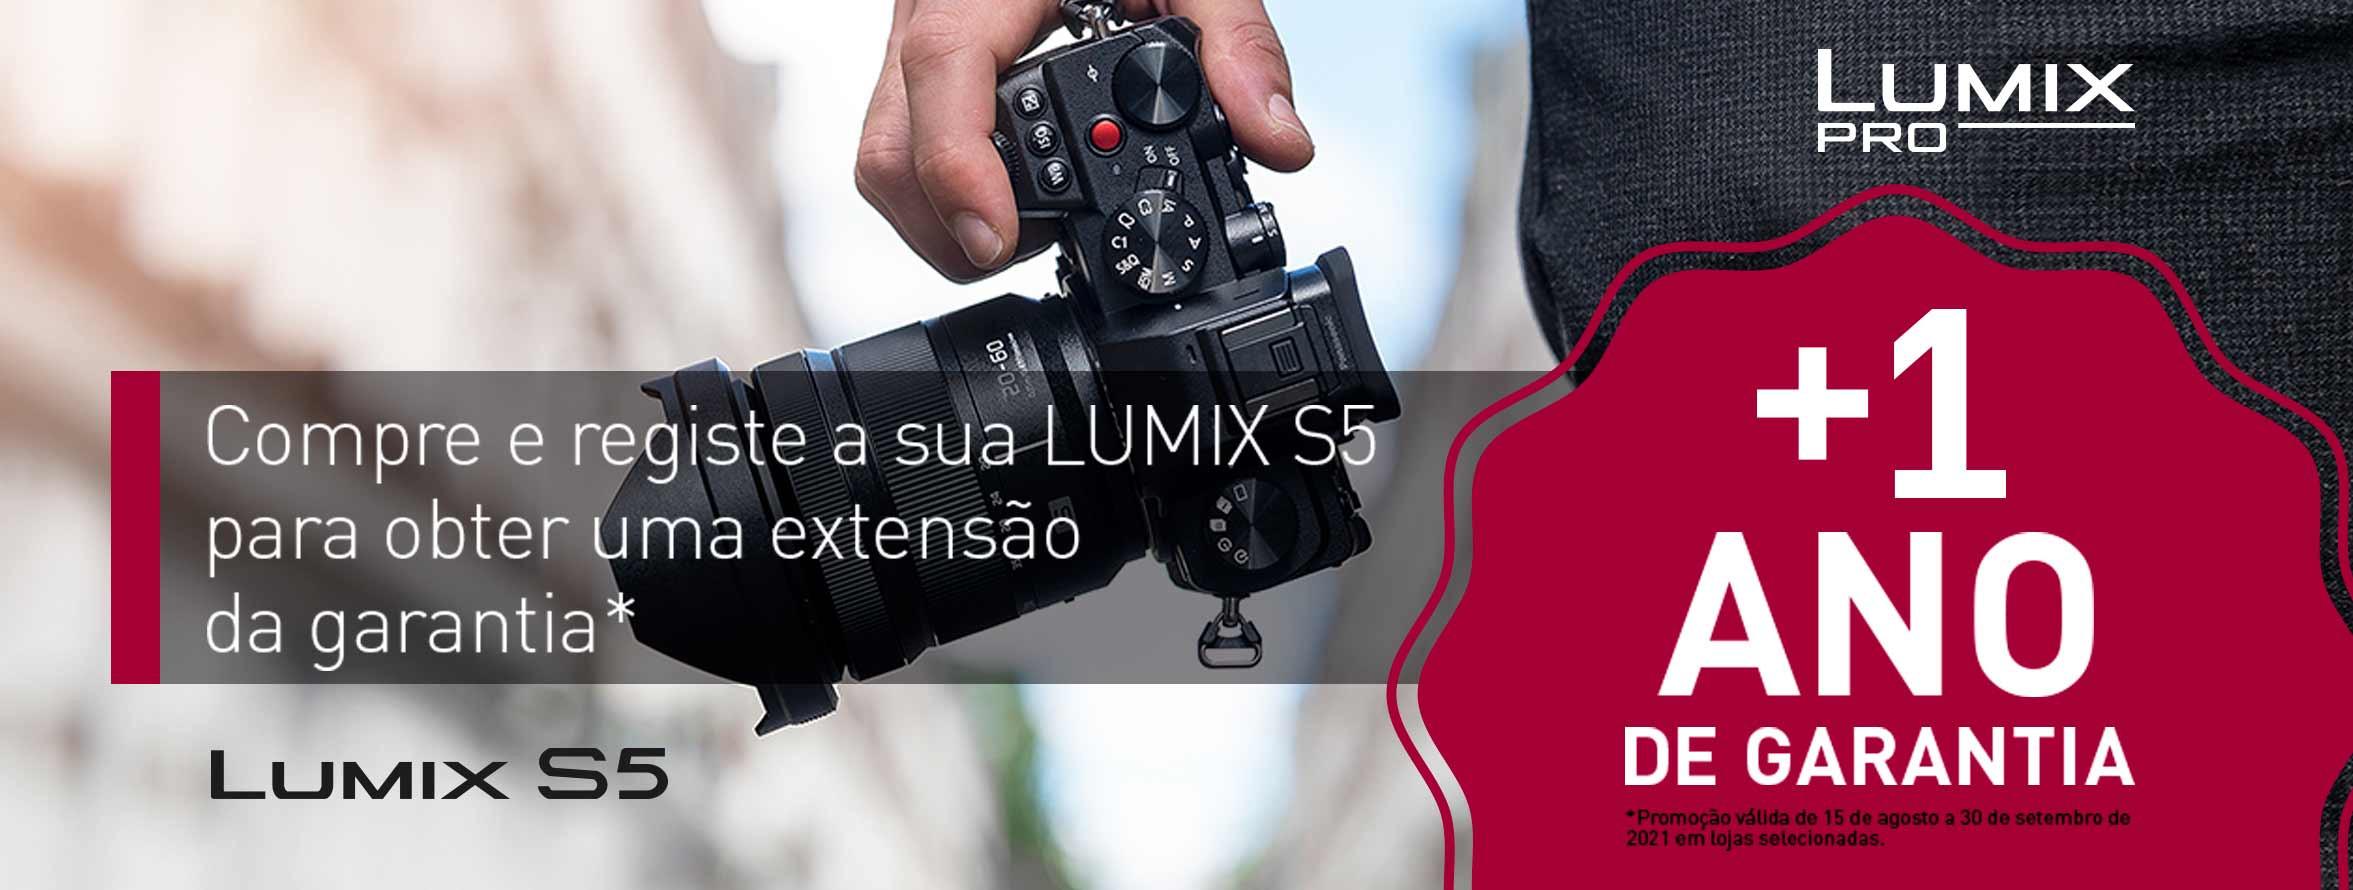 Lumix Promo S5 - 1 Ano Extra de Garantia Coloreffects